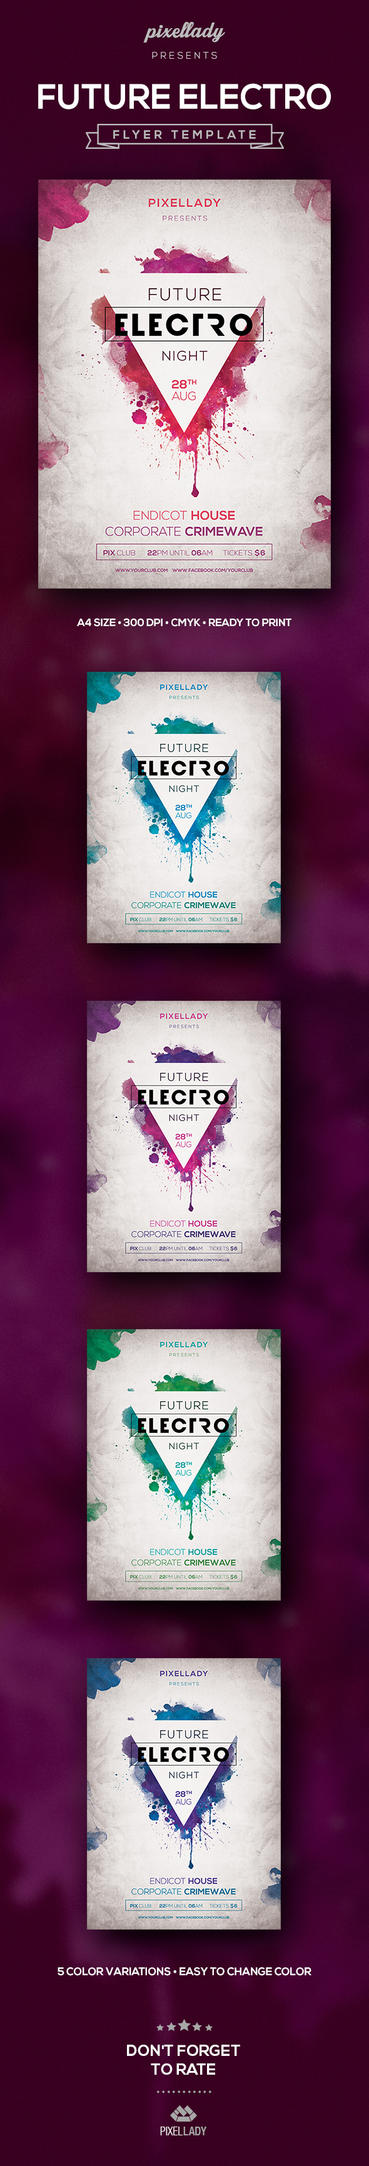 Future Electro Flyer by PixelladyArt